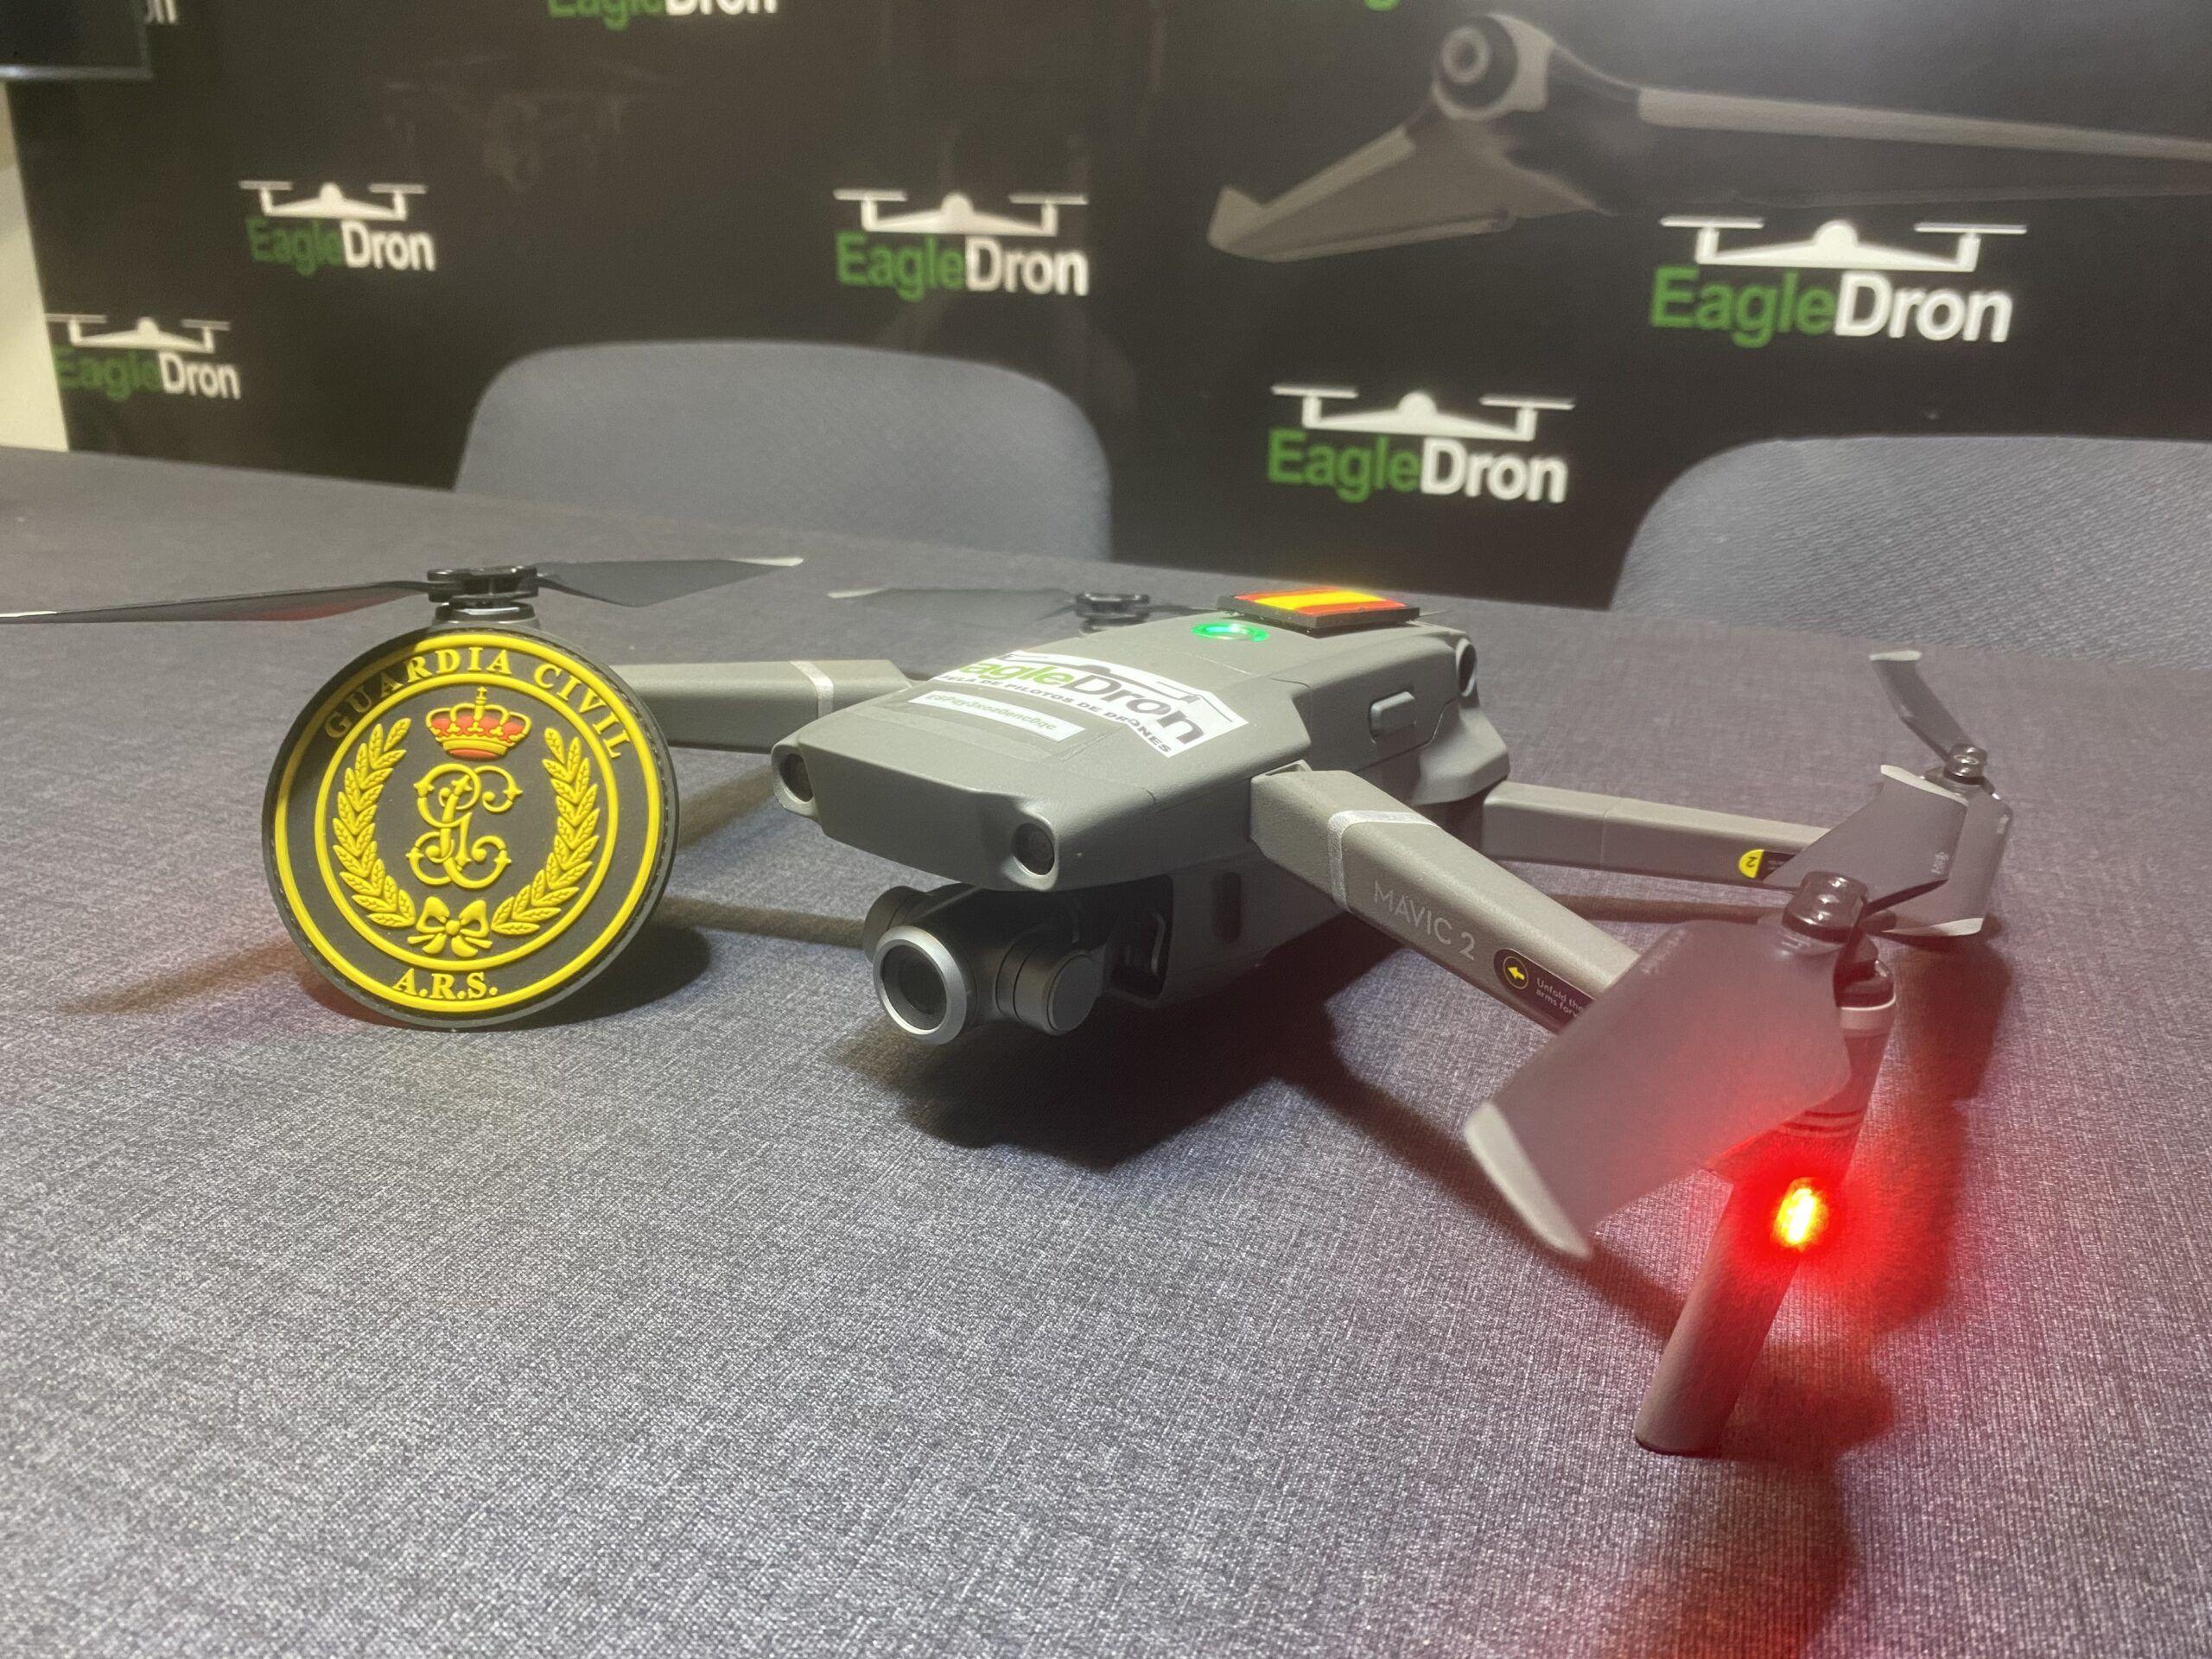 Guardia Civil Agradecimiento EagleDron dron Mavic del GRS